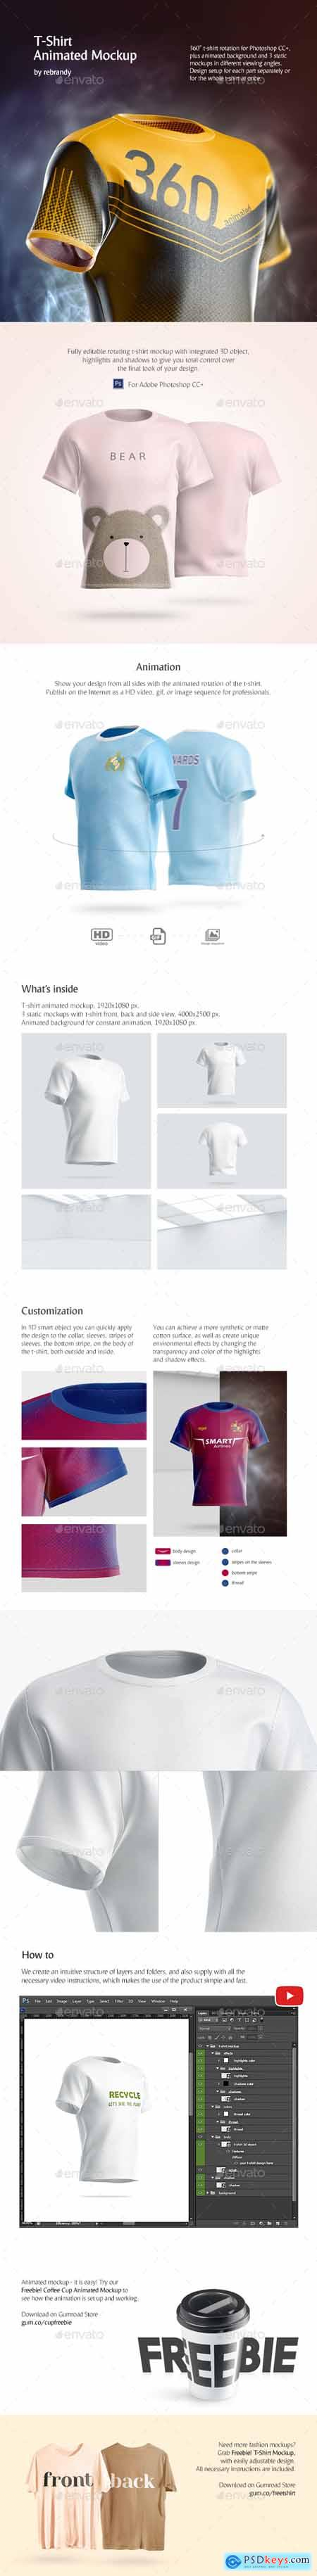 T-Shirt Animated Mockup 24720128